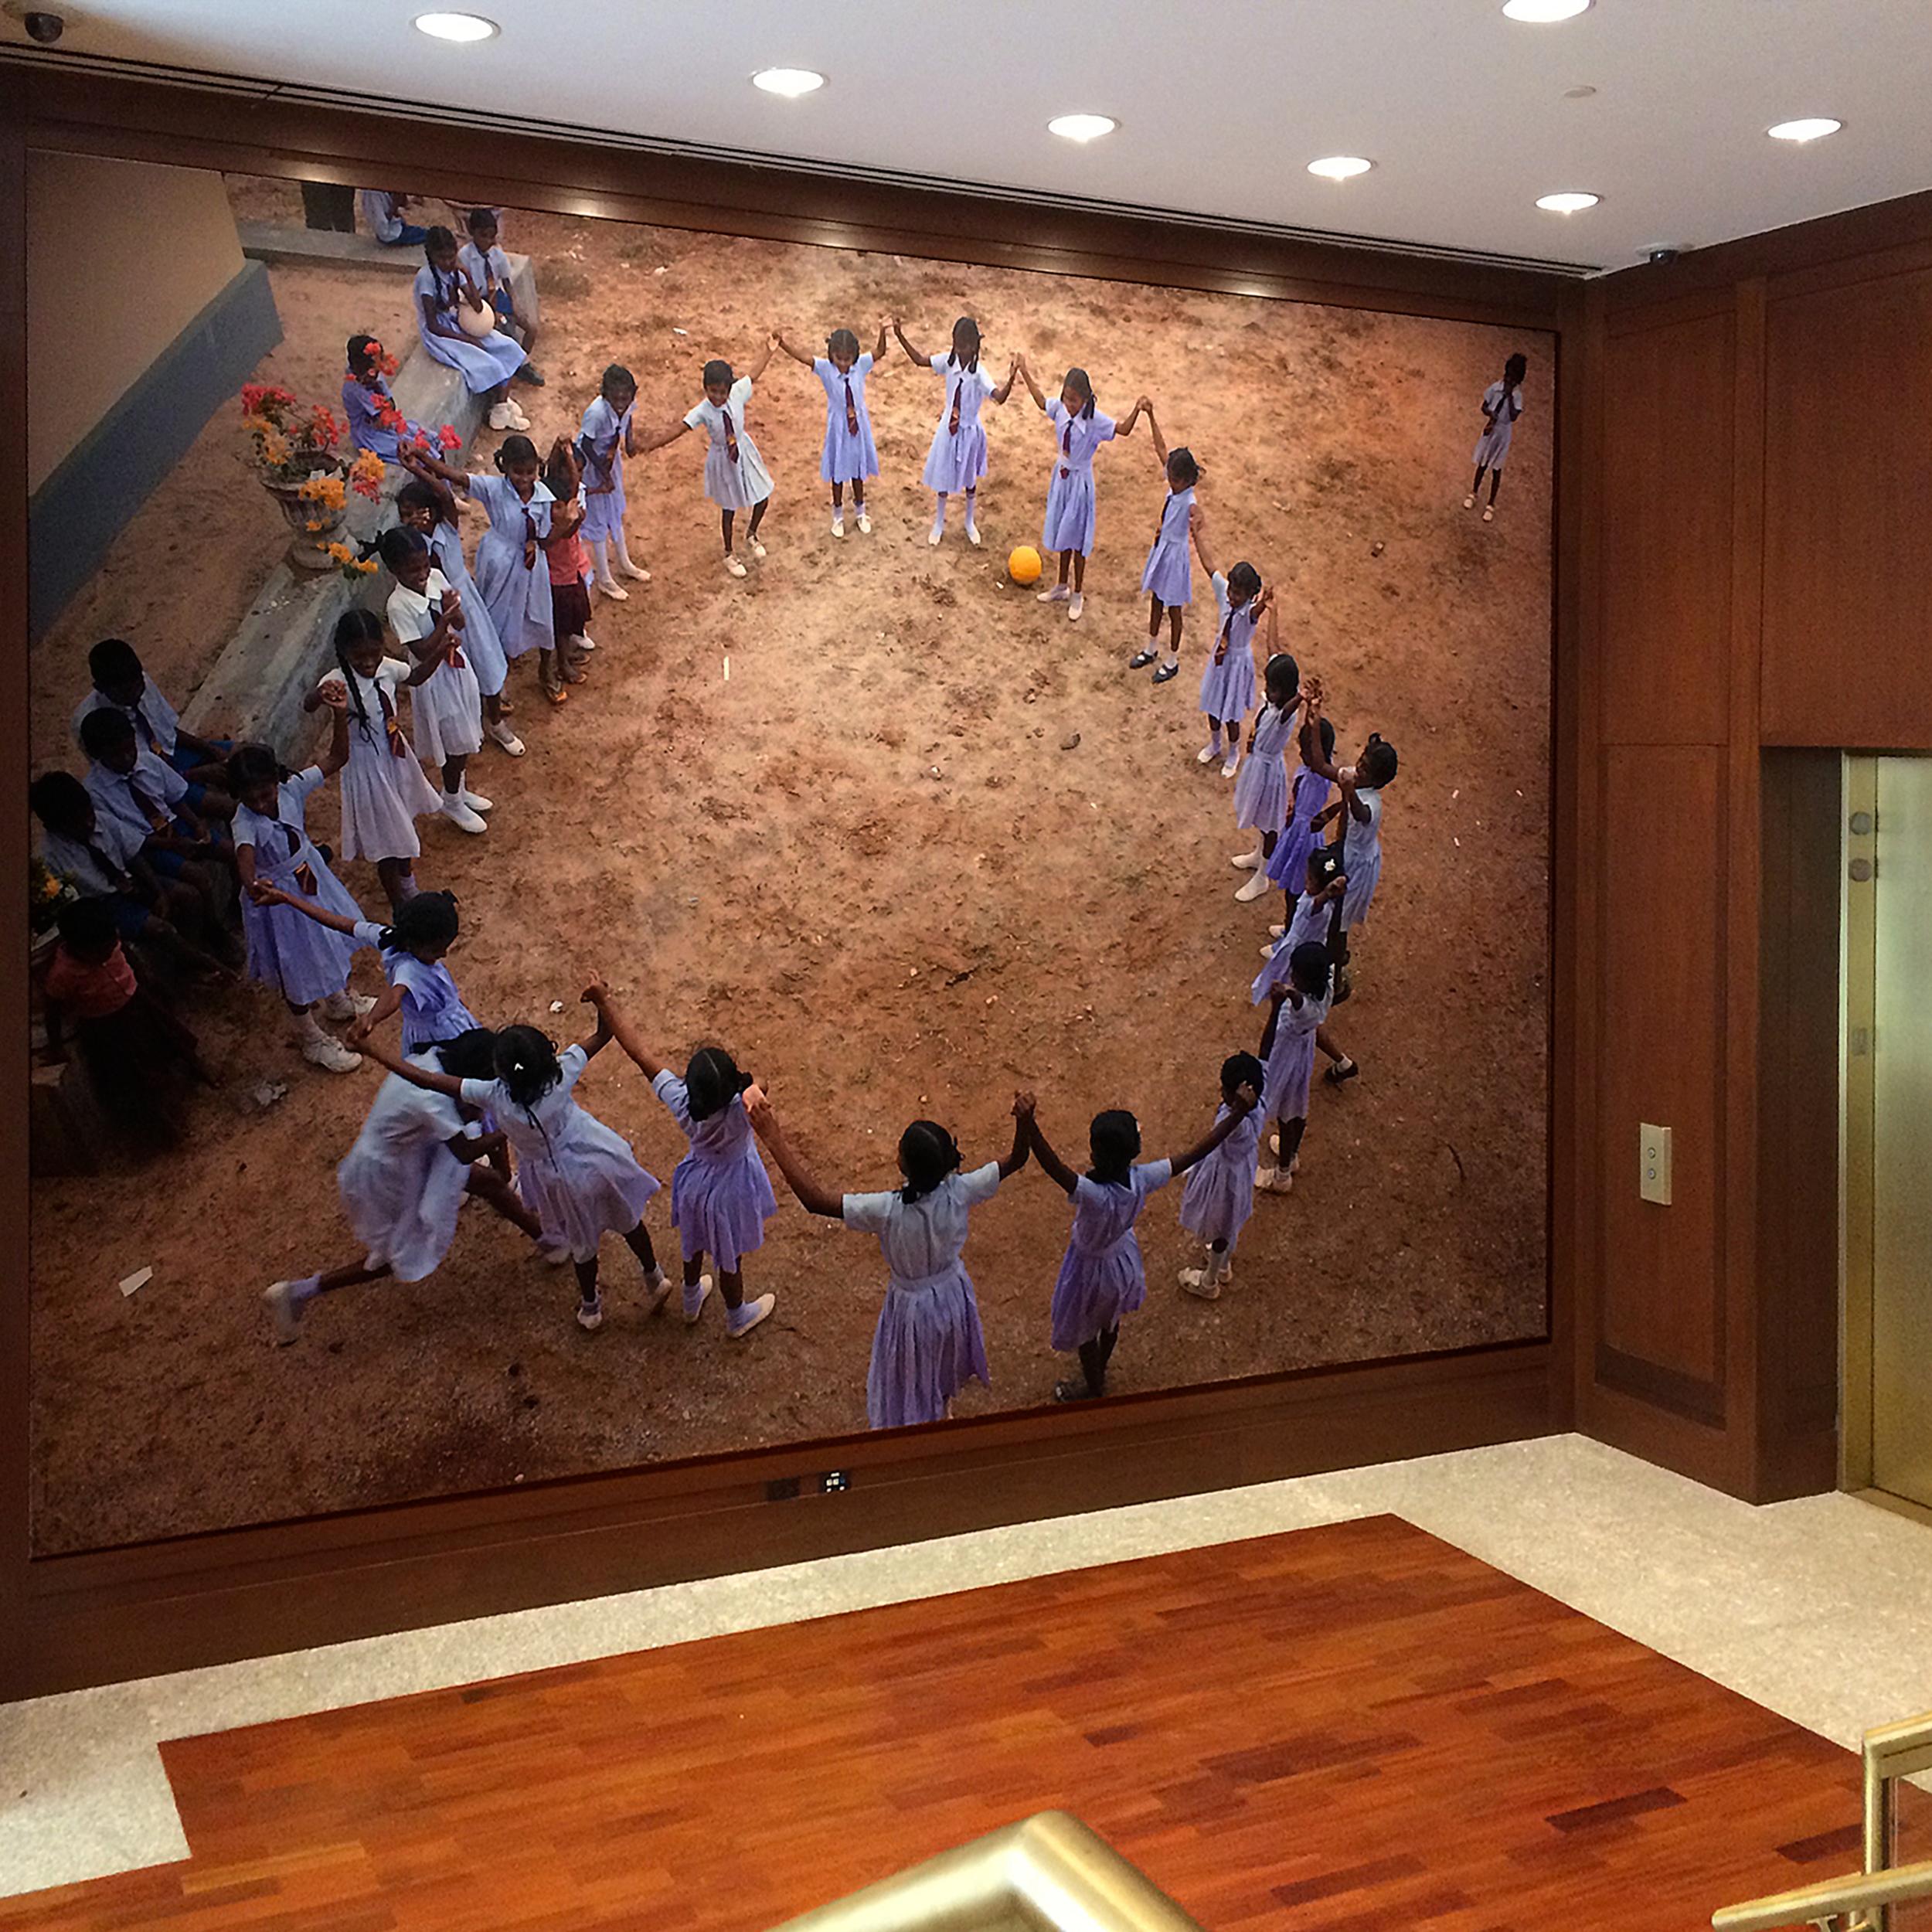 22ft x 15ft school children image at rear lobby elevator banks